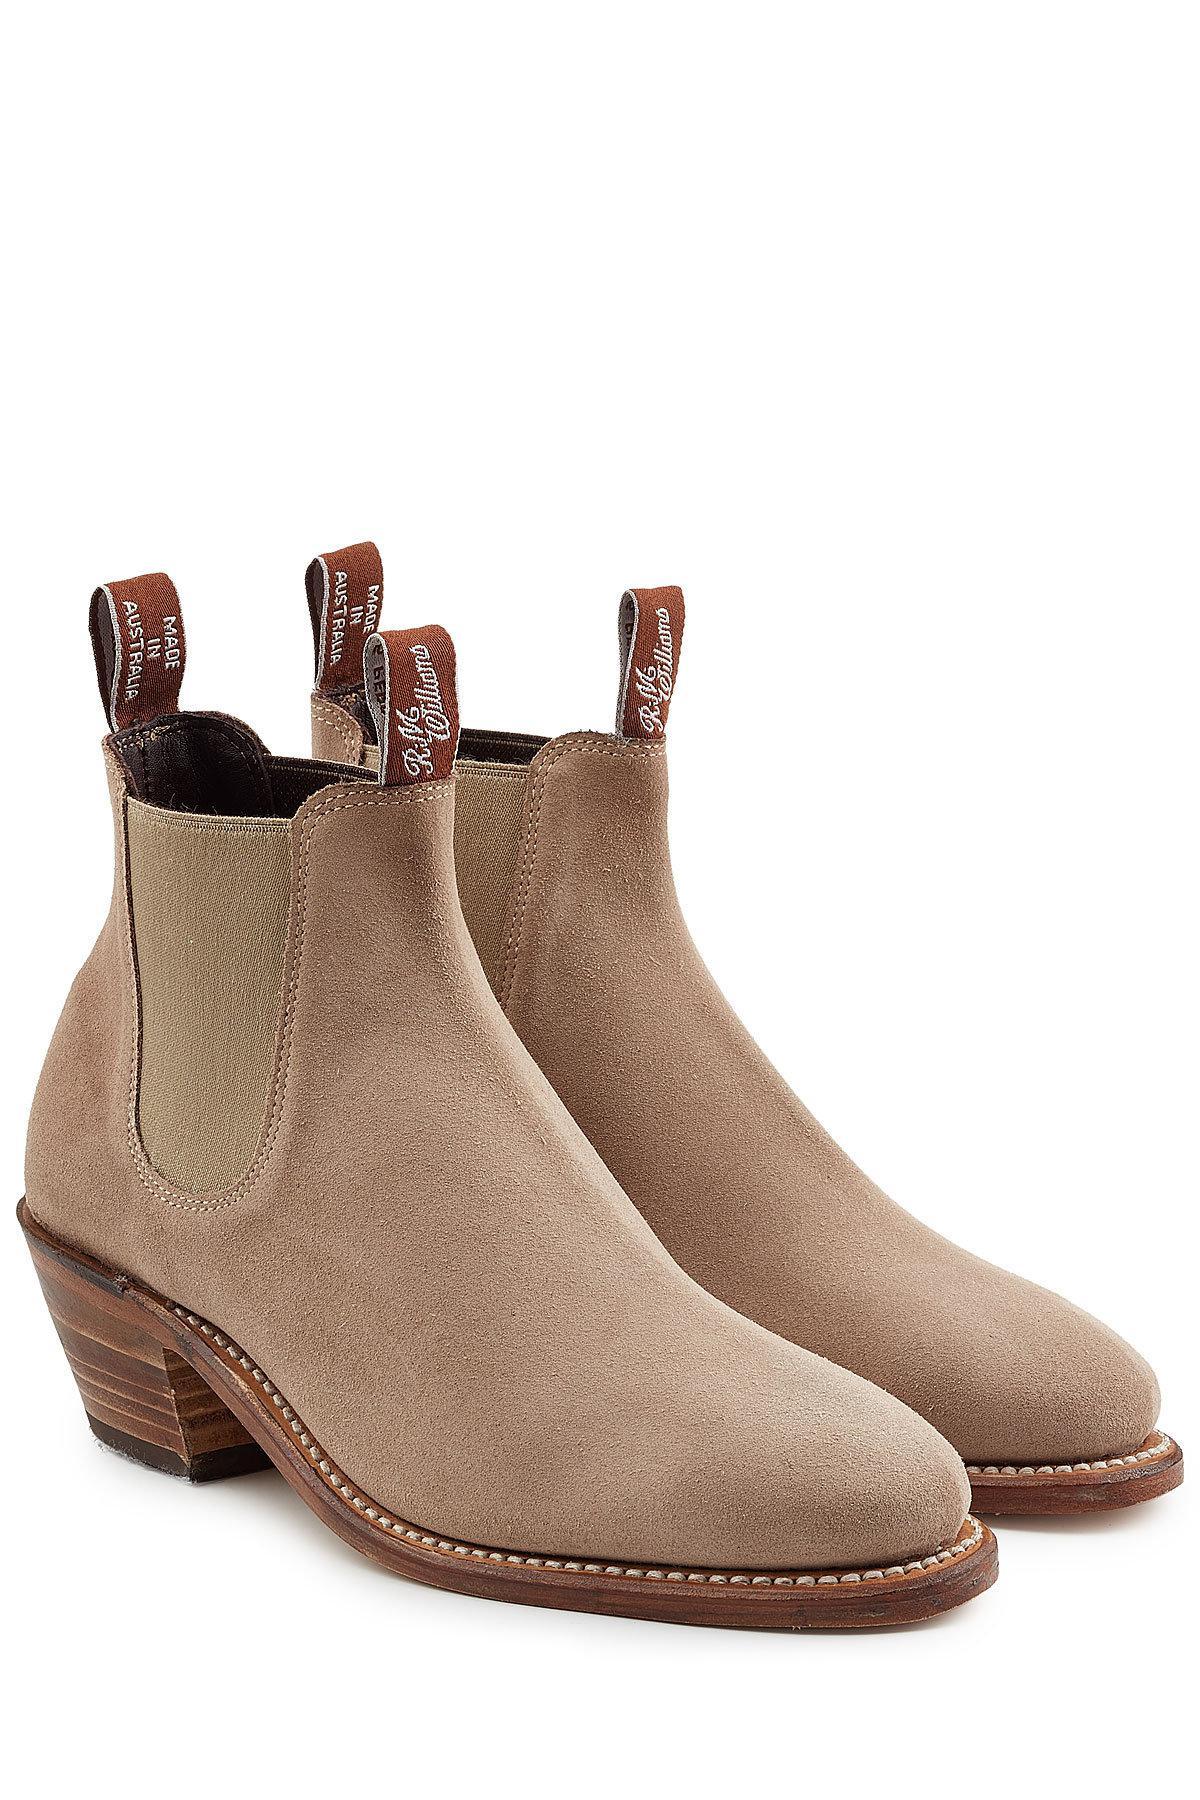 63381807d97 R.m. Williams Brown Adelaide Suede Boot Heels